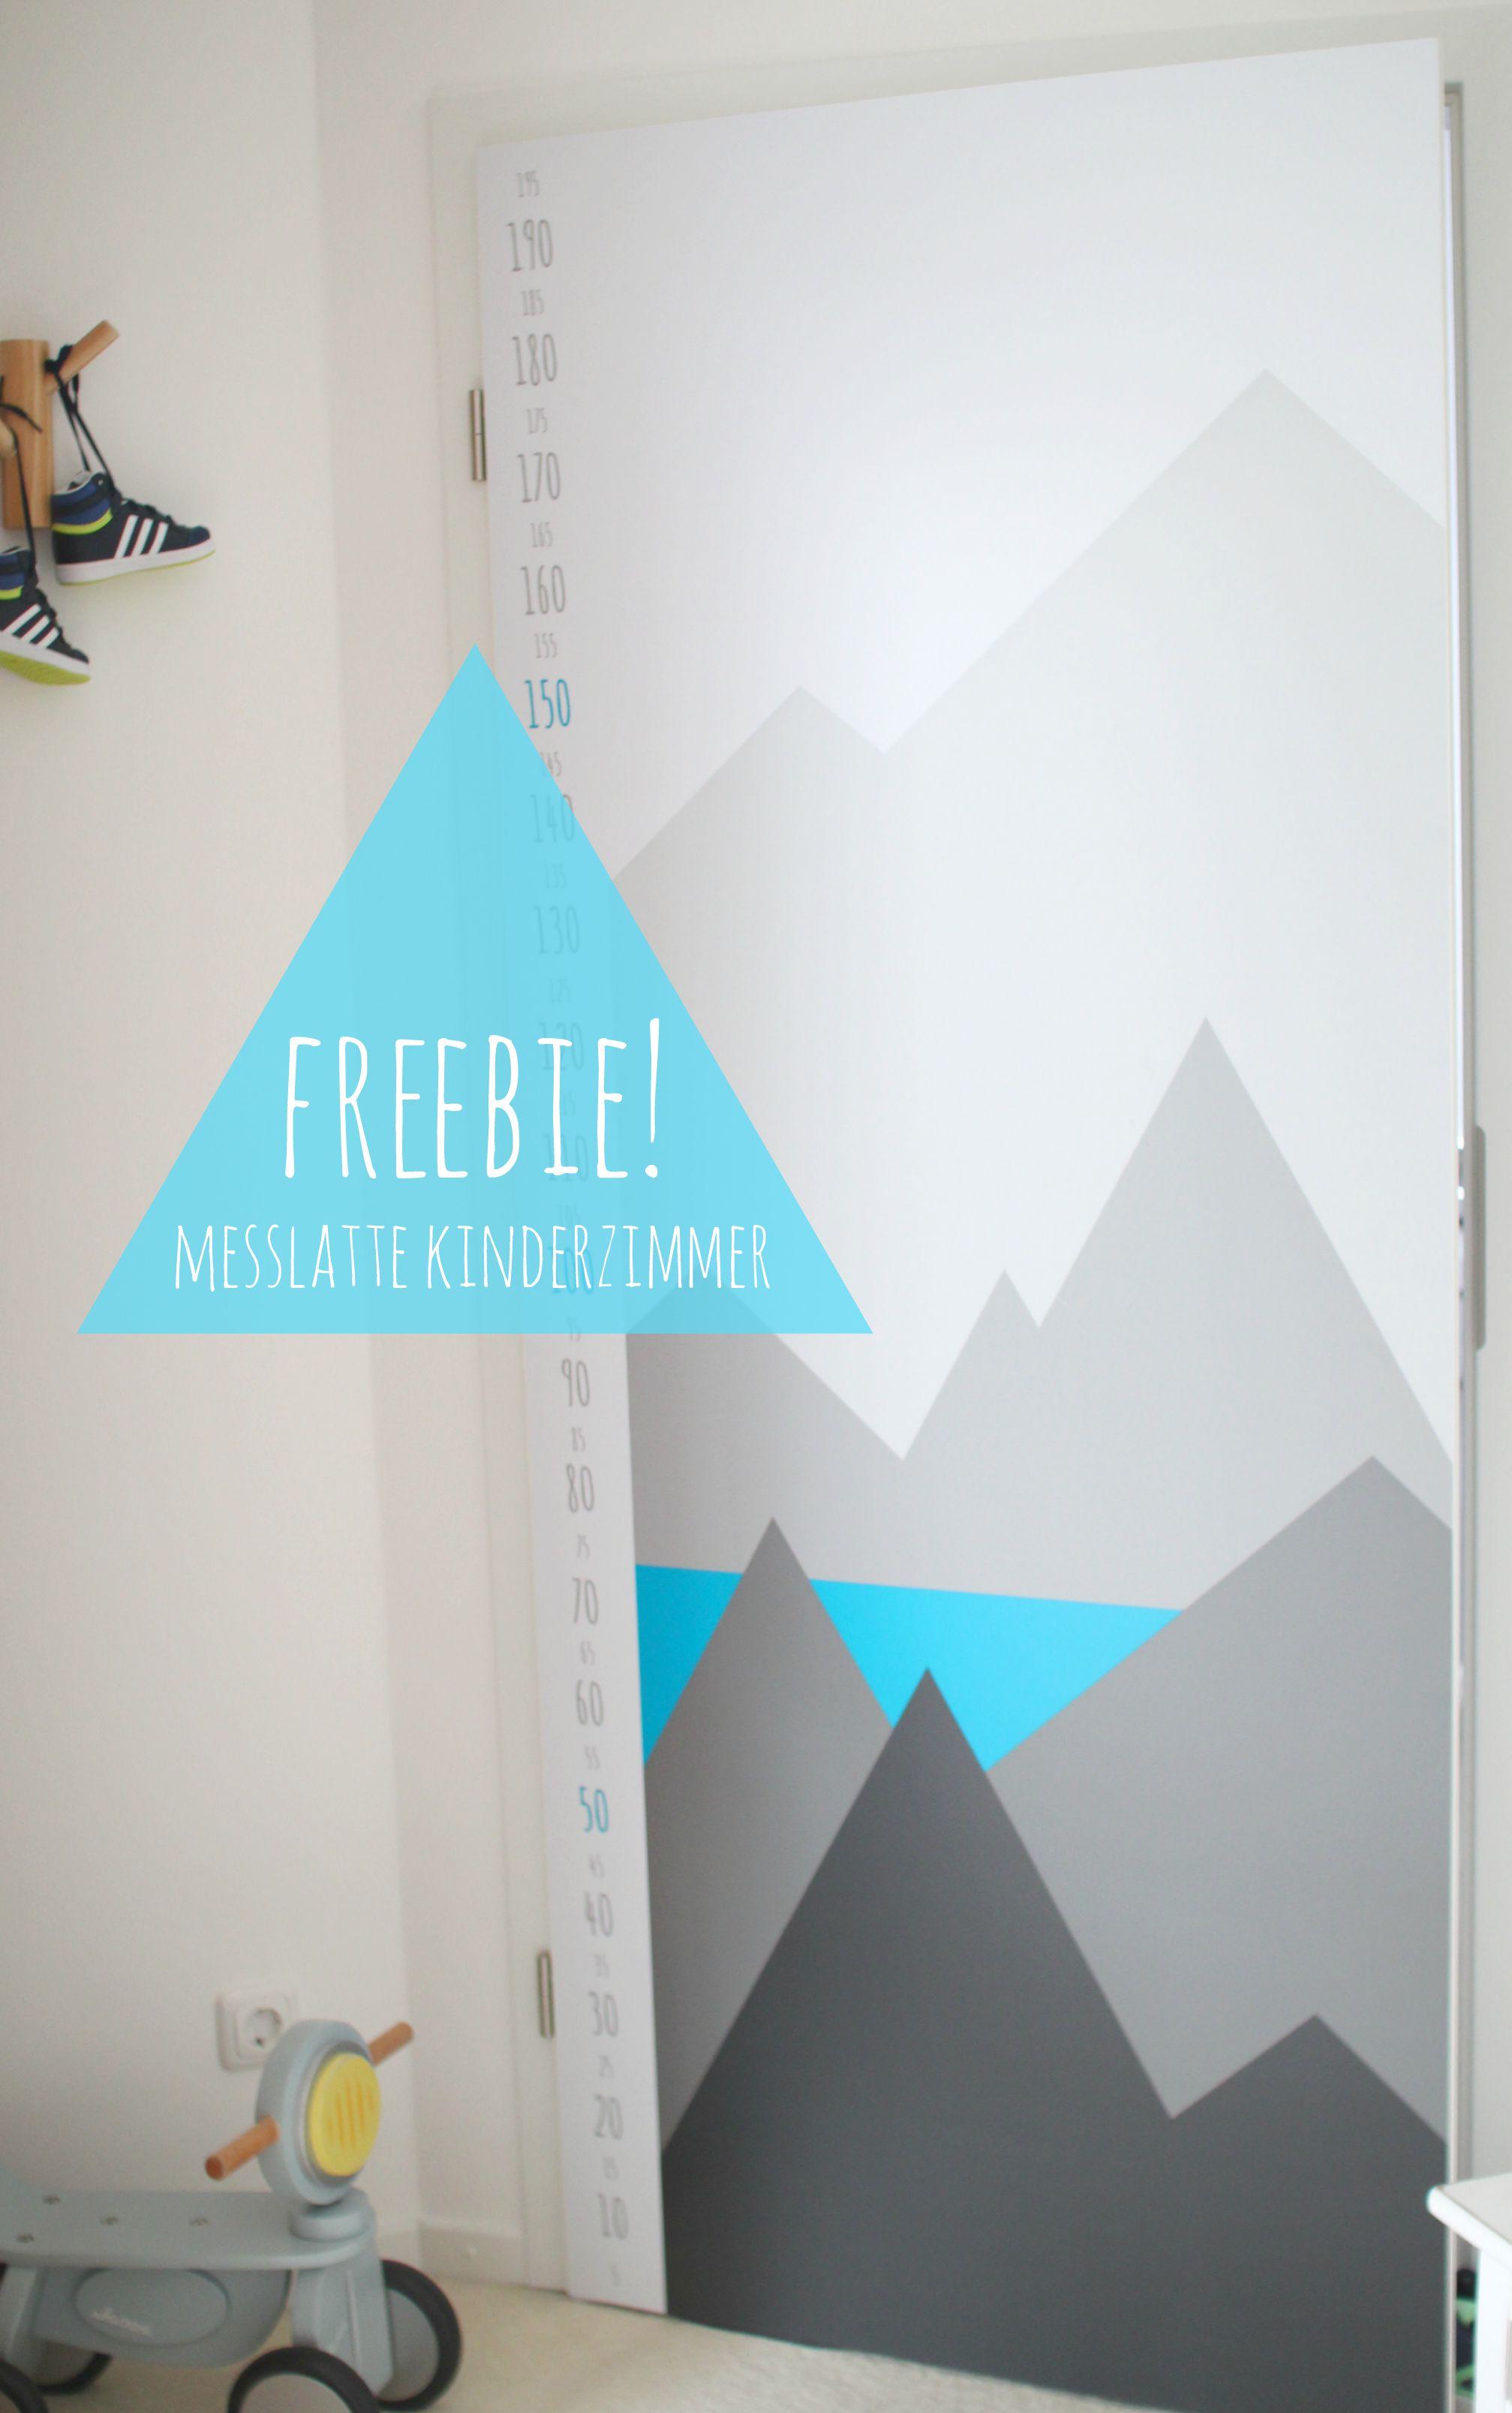 04-Freebie-Messlatte-Kinderzimmer